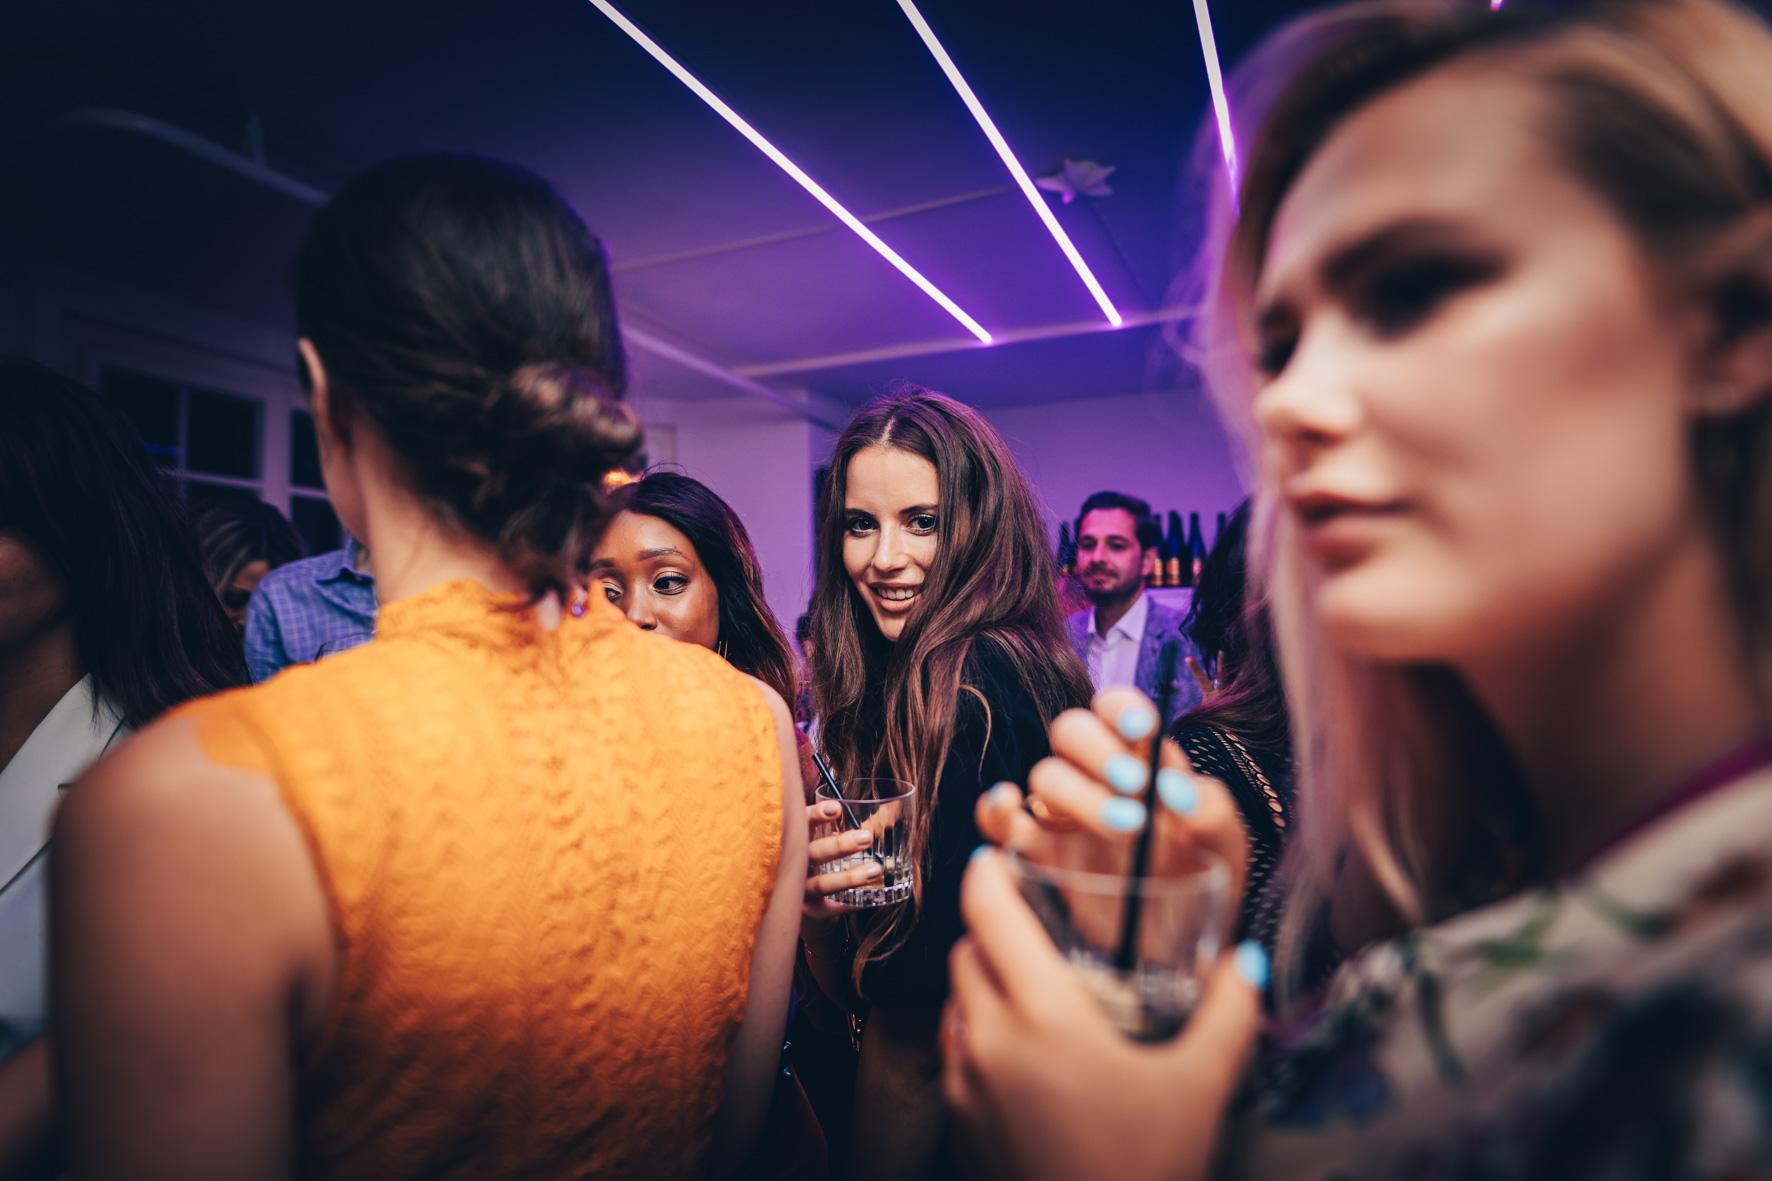 Konrad-lifestyle-art-basel-%22grand-party%22-2019-109.jpg